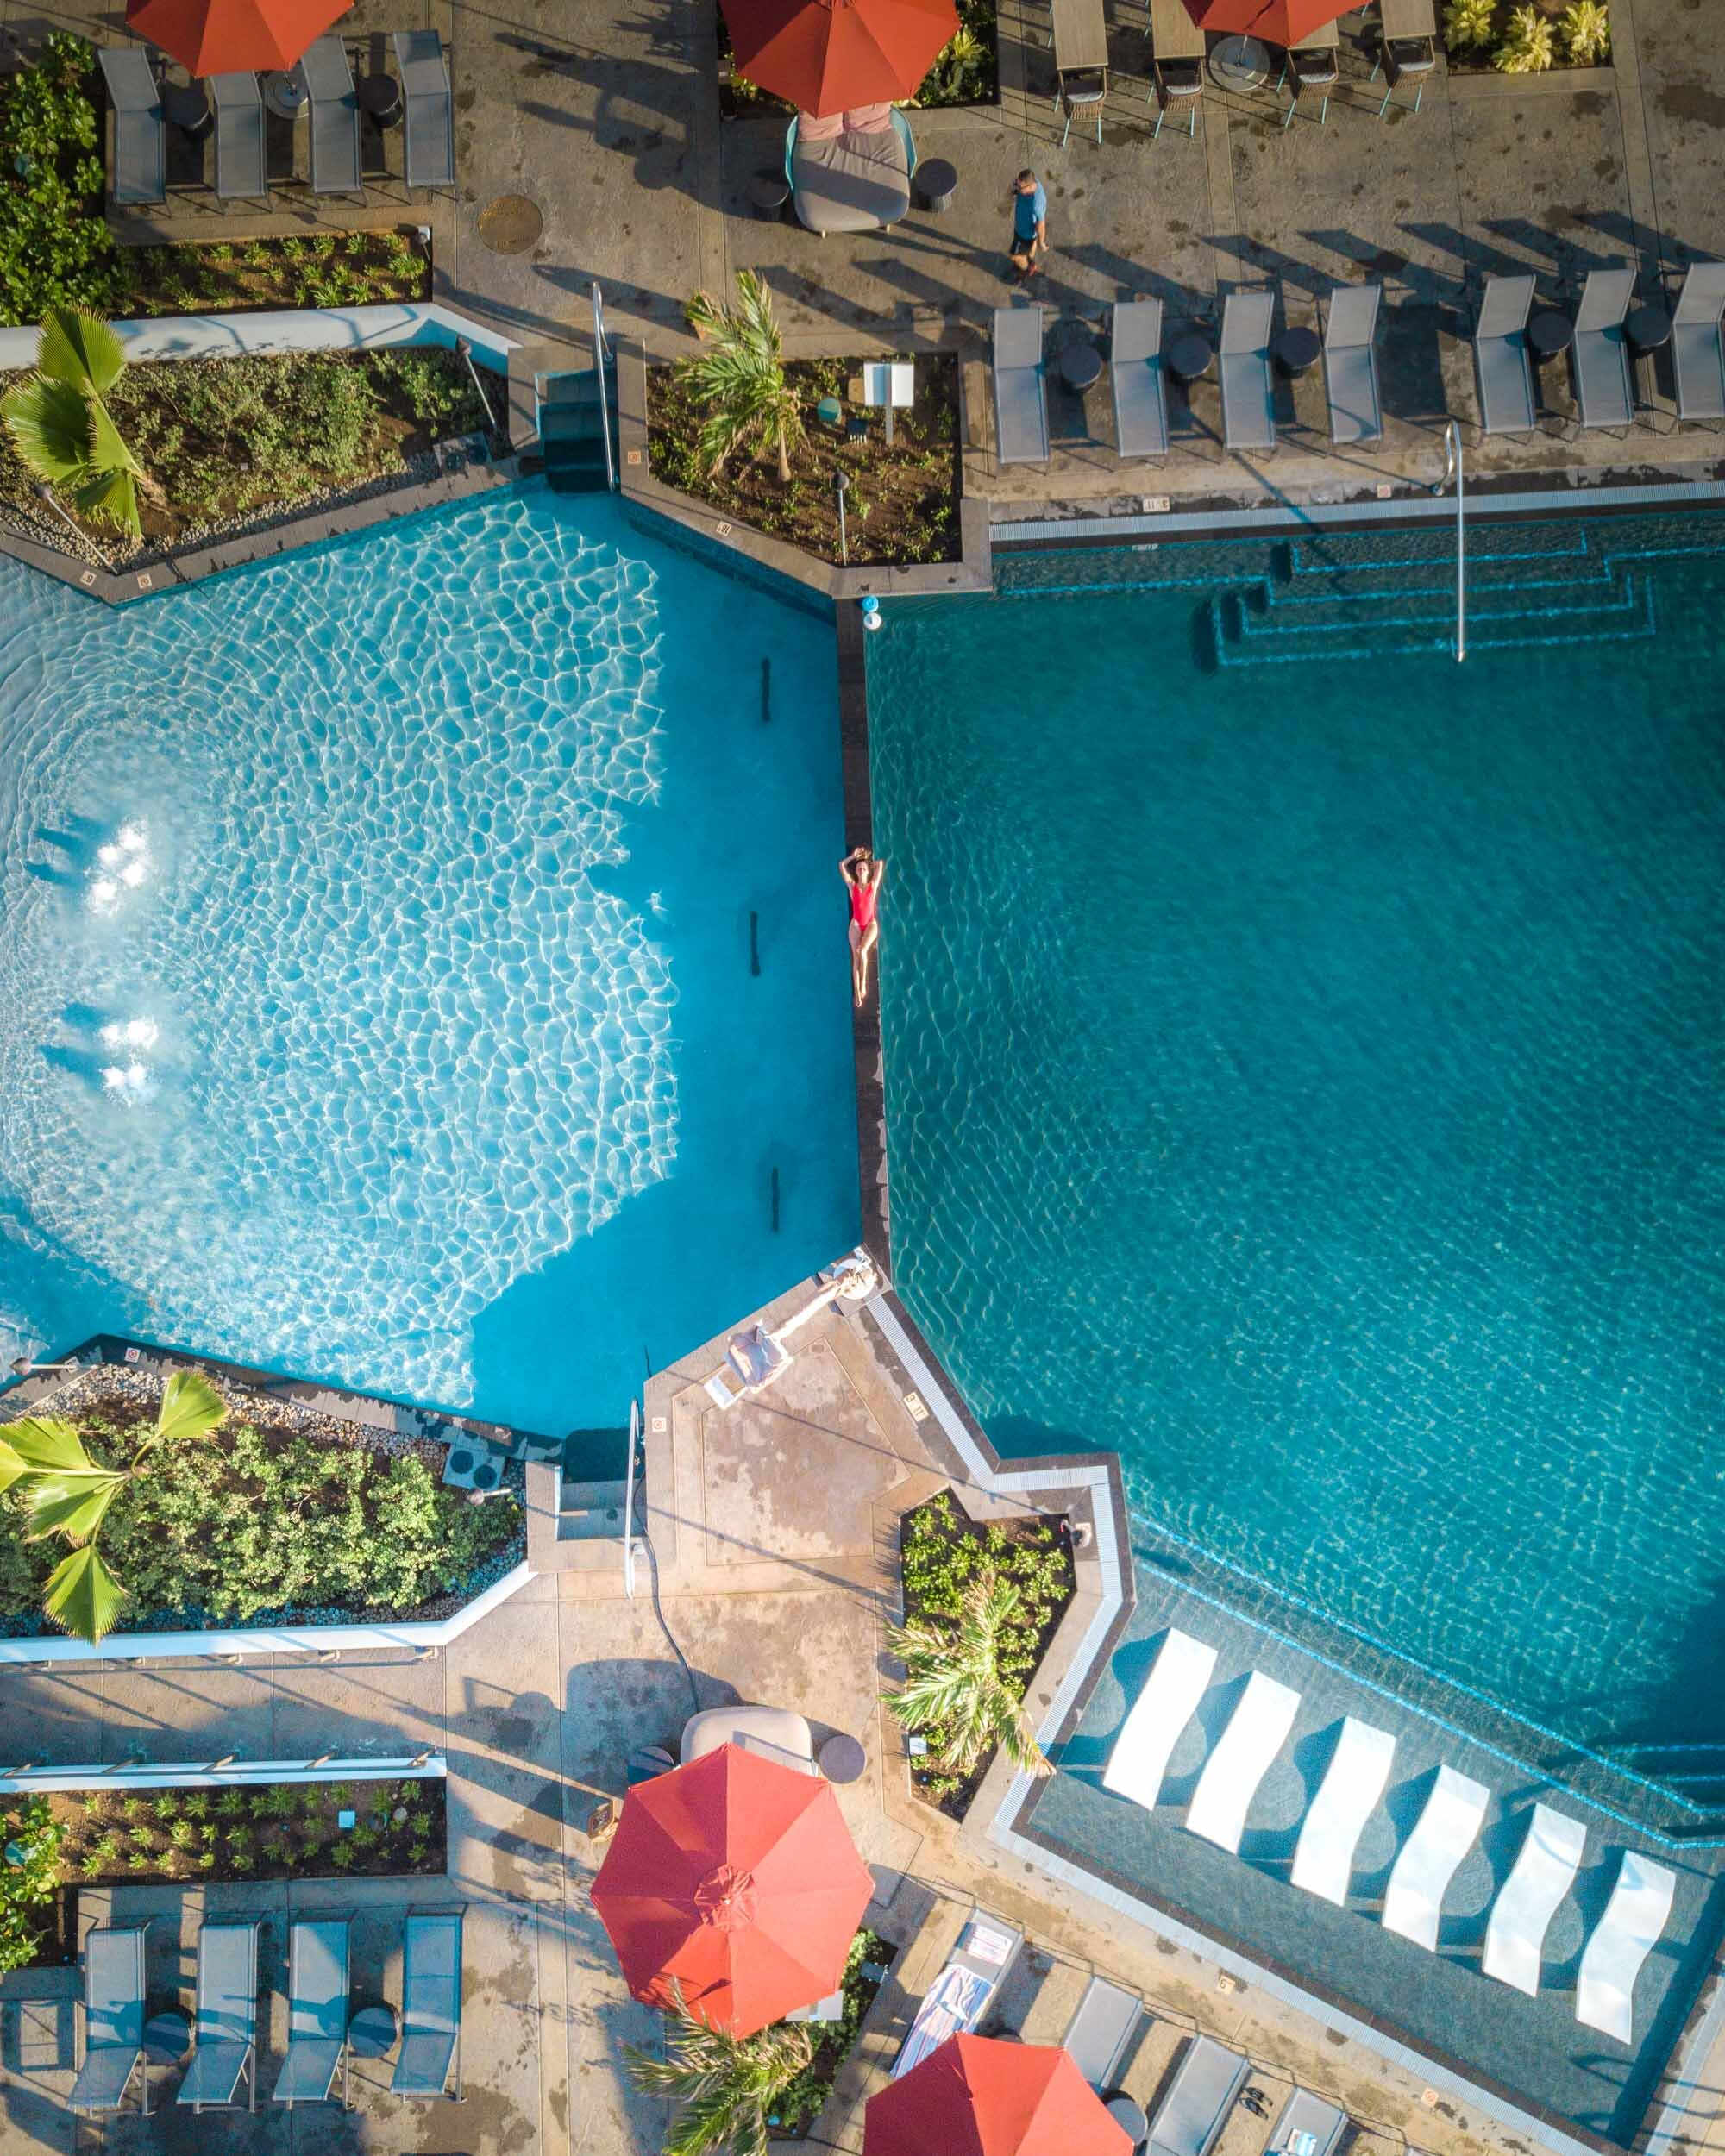 Aerial view of the pool area at Sheraton Kauai Coconut Beach Resort.